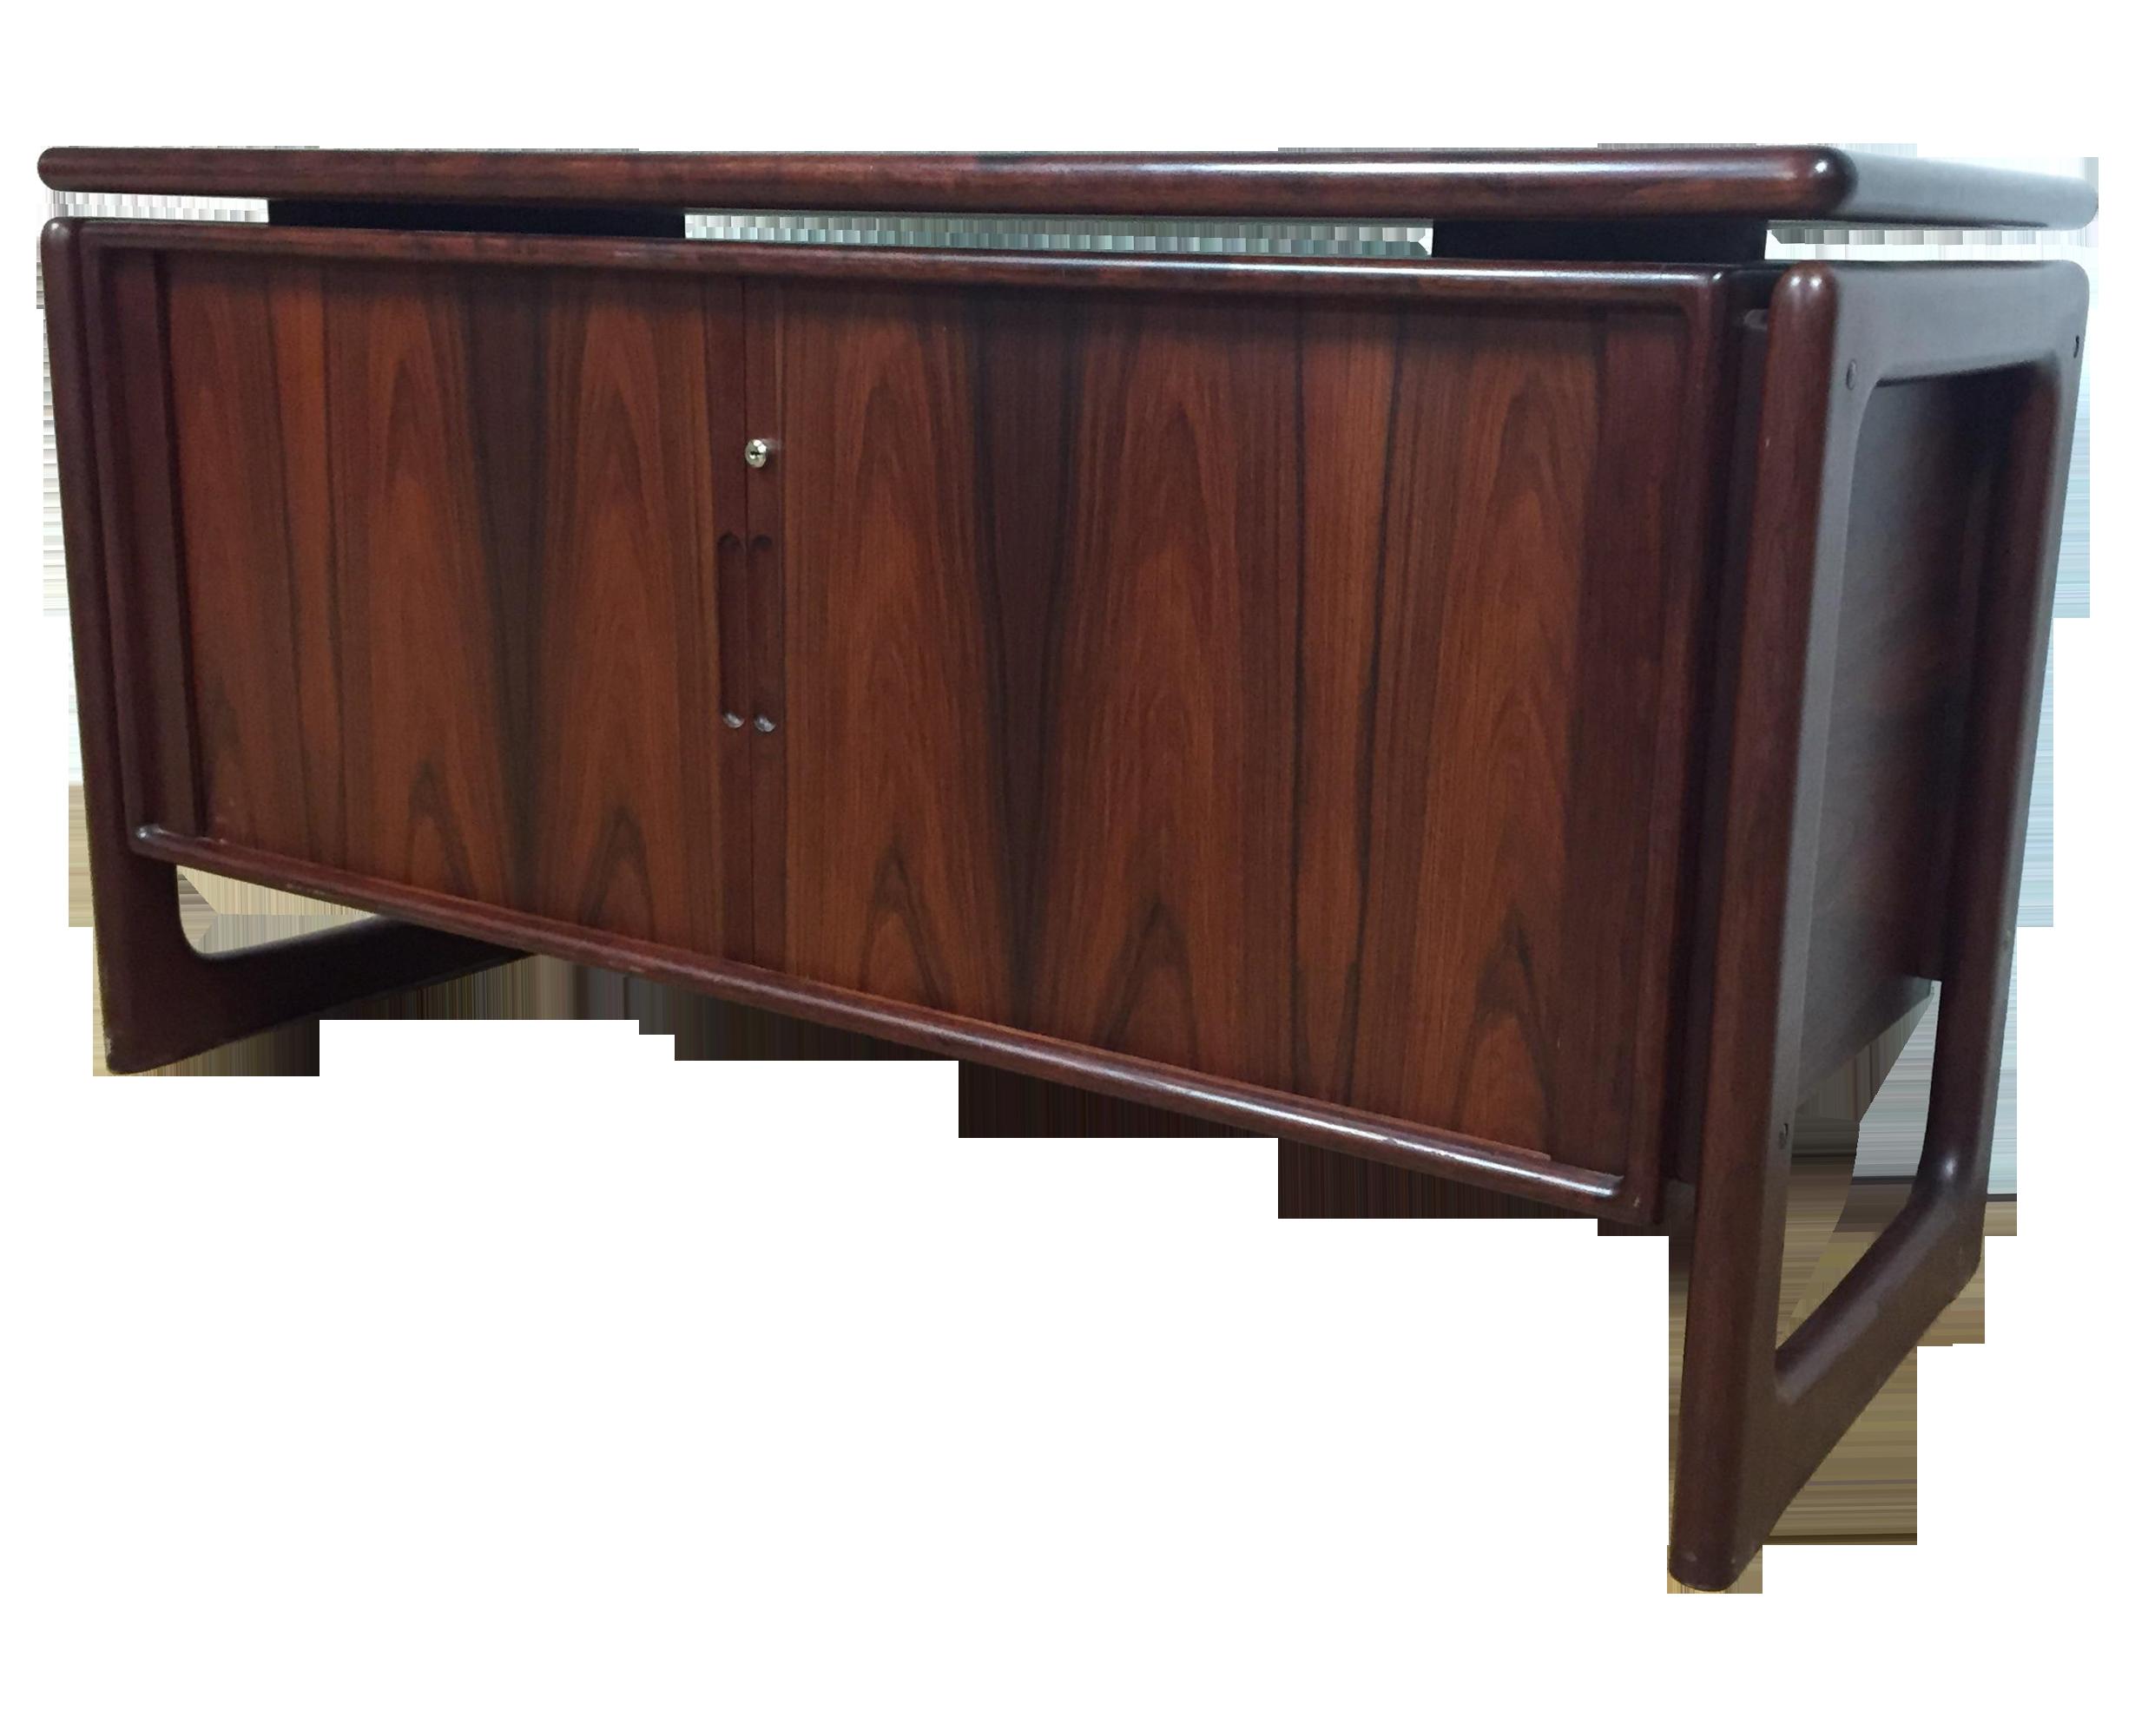 Danish Buffet Credenza : Furniture danish credenza sideboard vs buffet antique